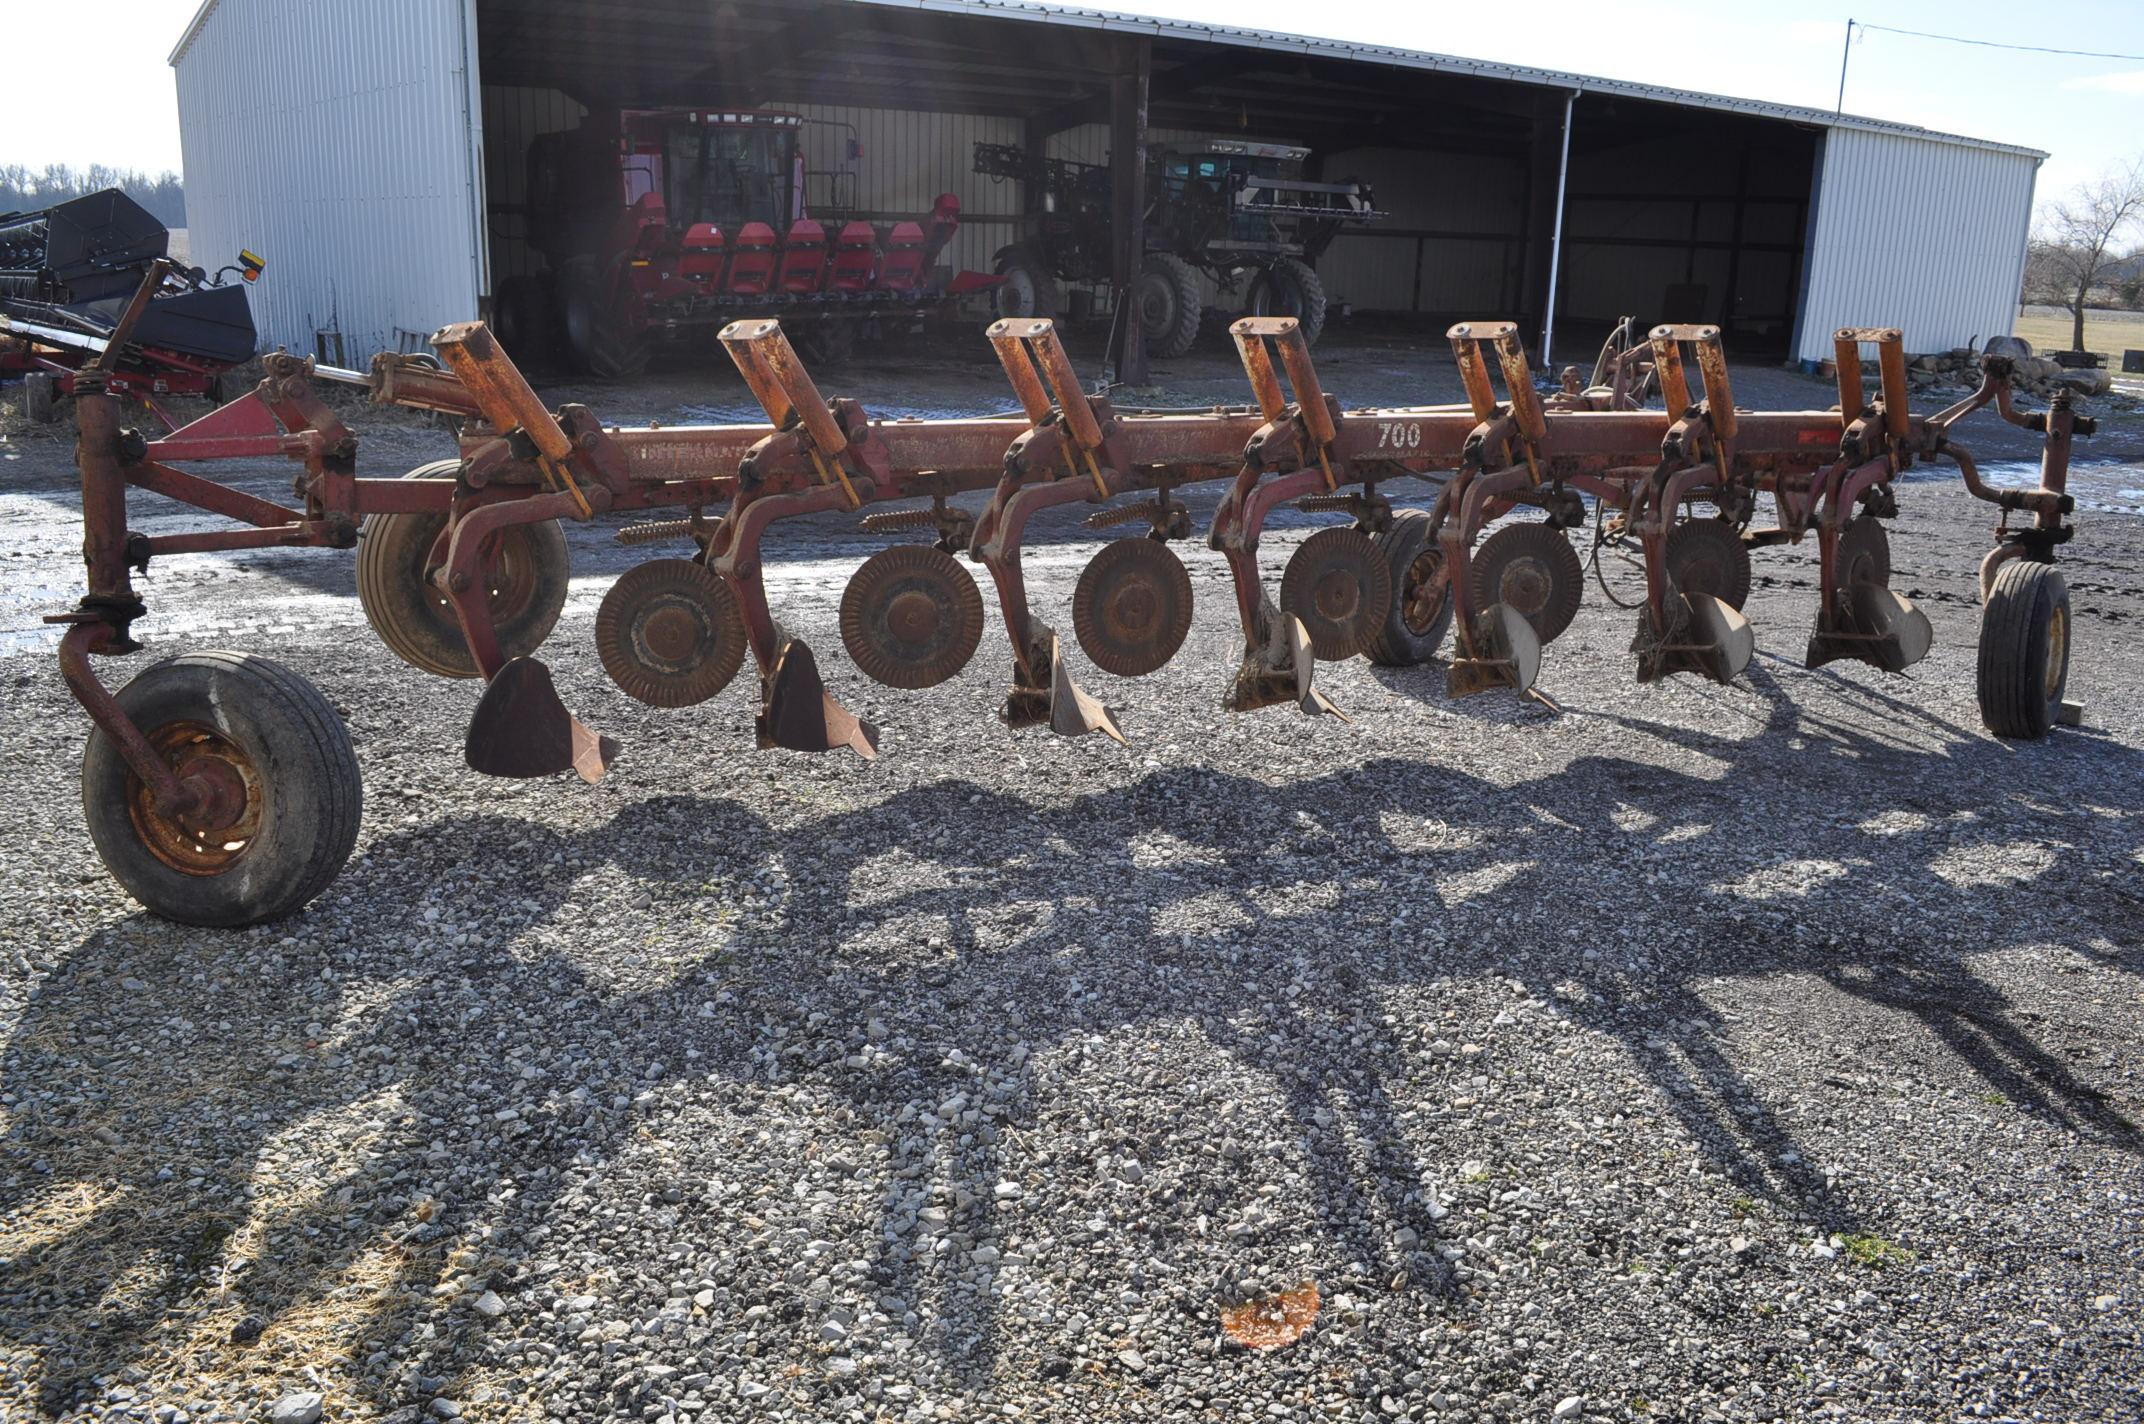 International 700 onland moldboard plow, 7 btm, auto reset trip - Image 3 of 16